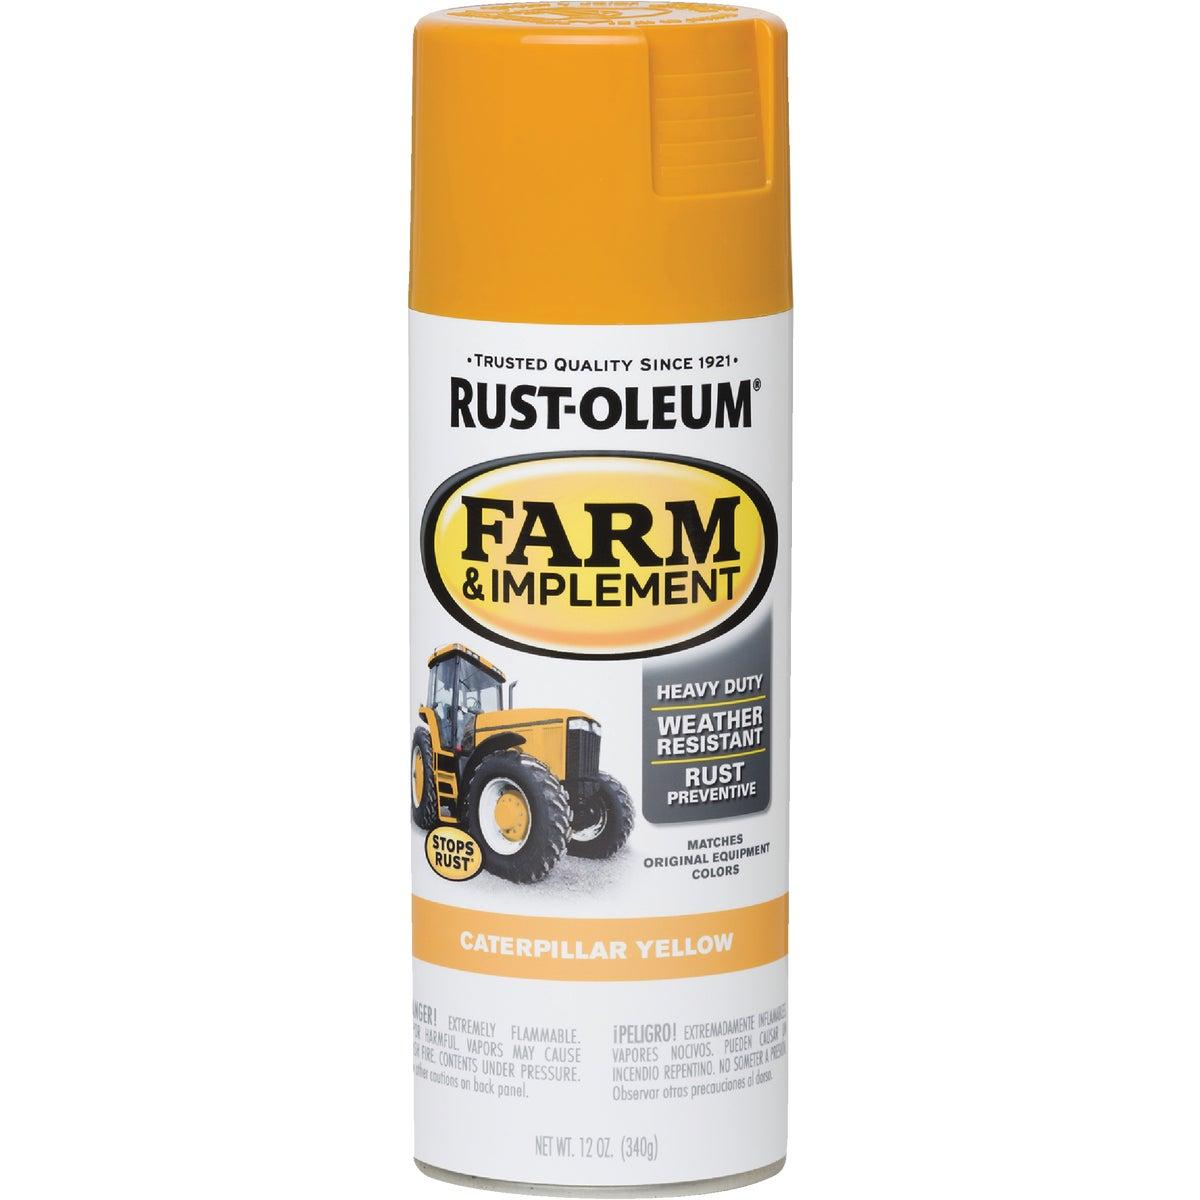 Rust Oleum CAT YELLOW SPRAY PAINT 7449-830